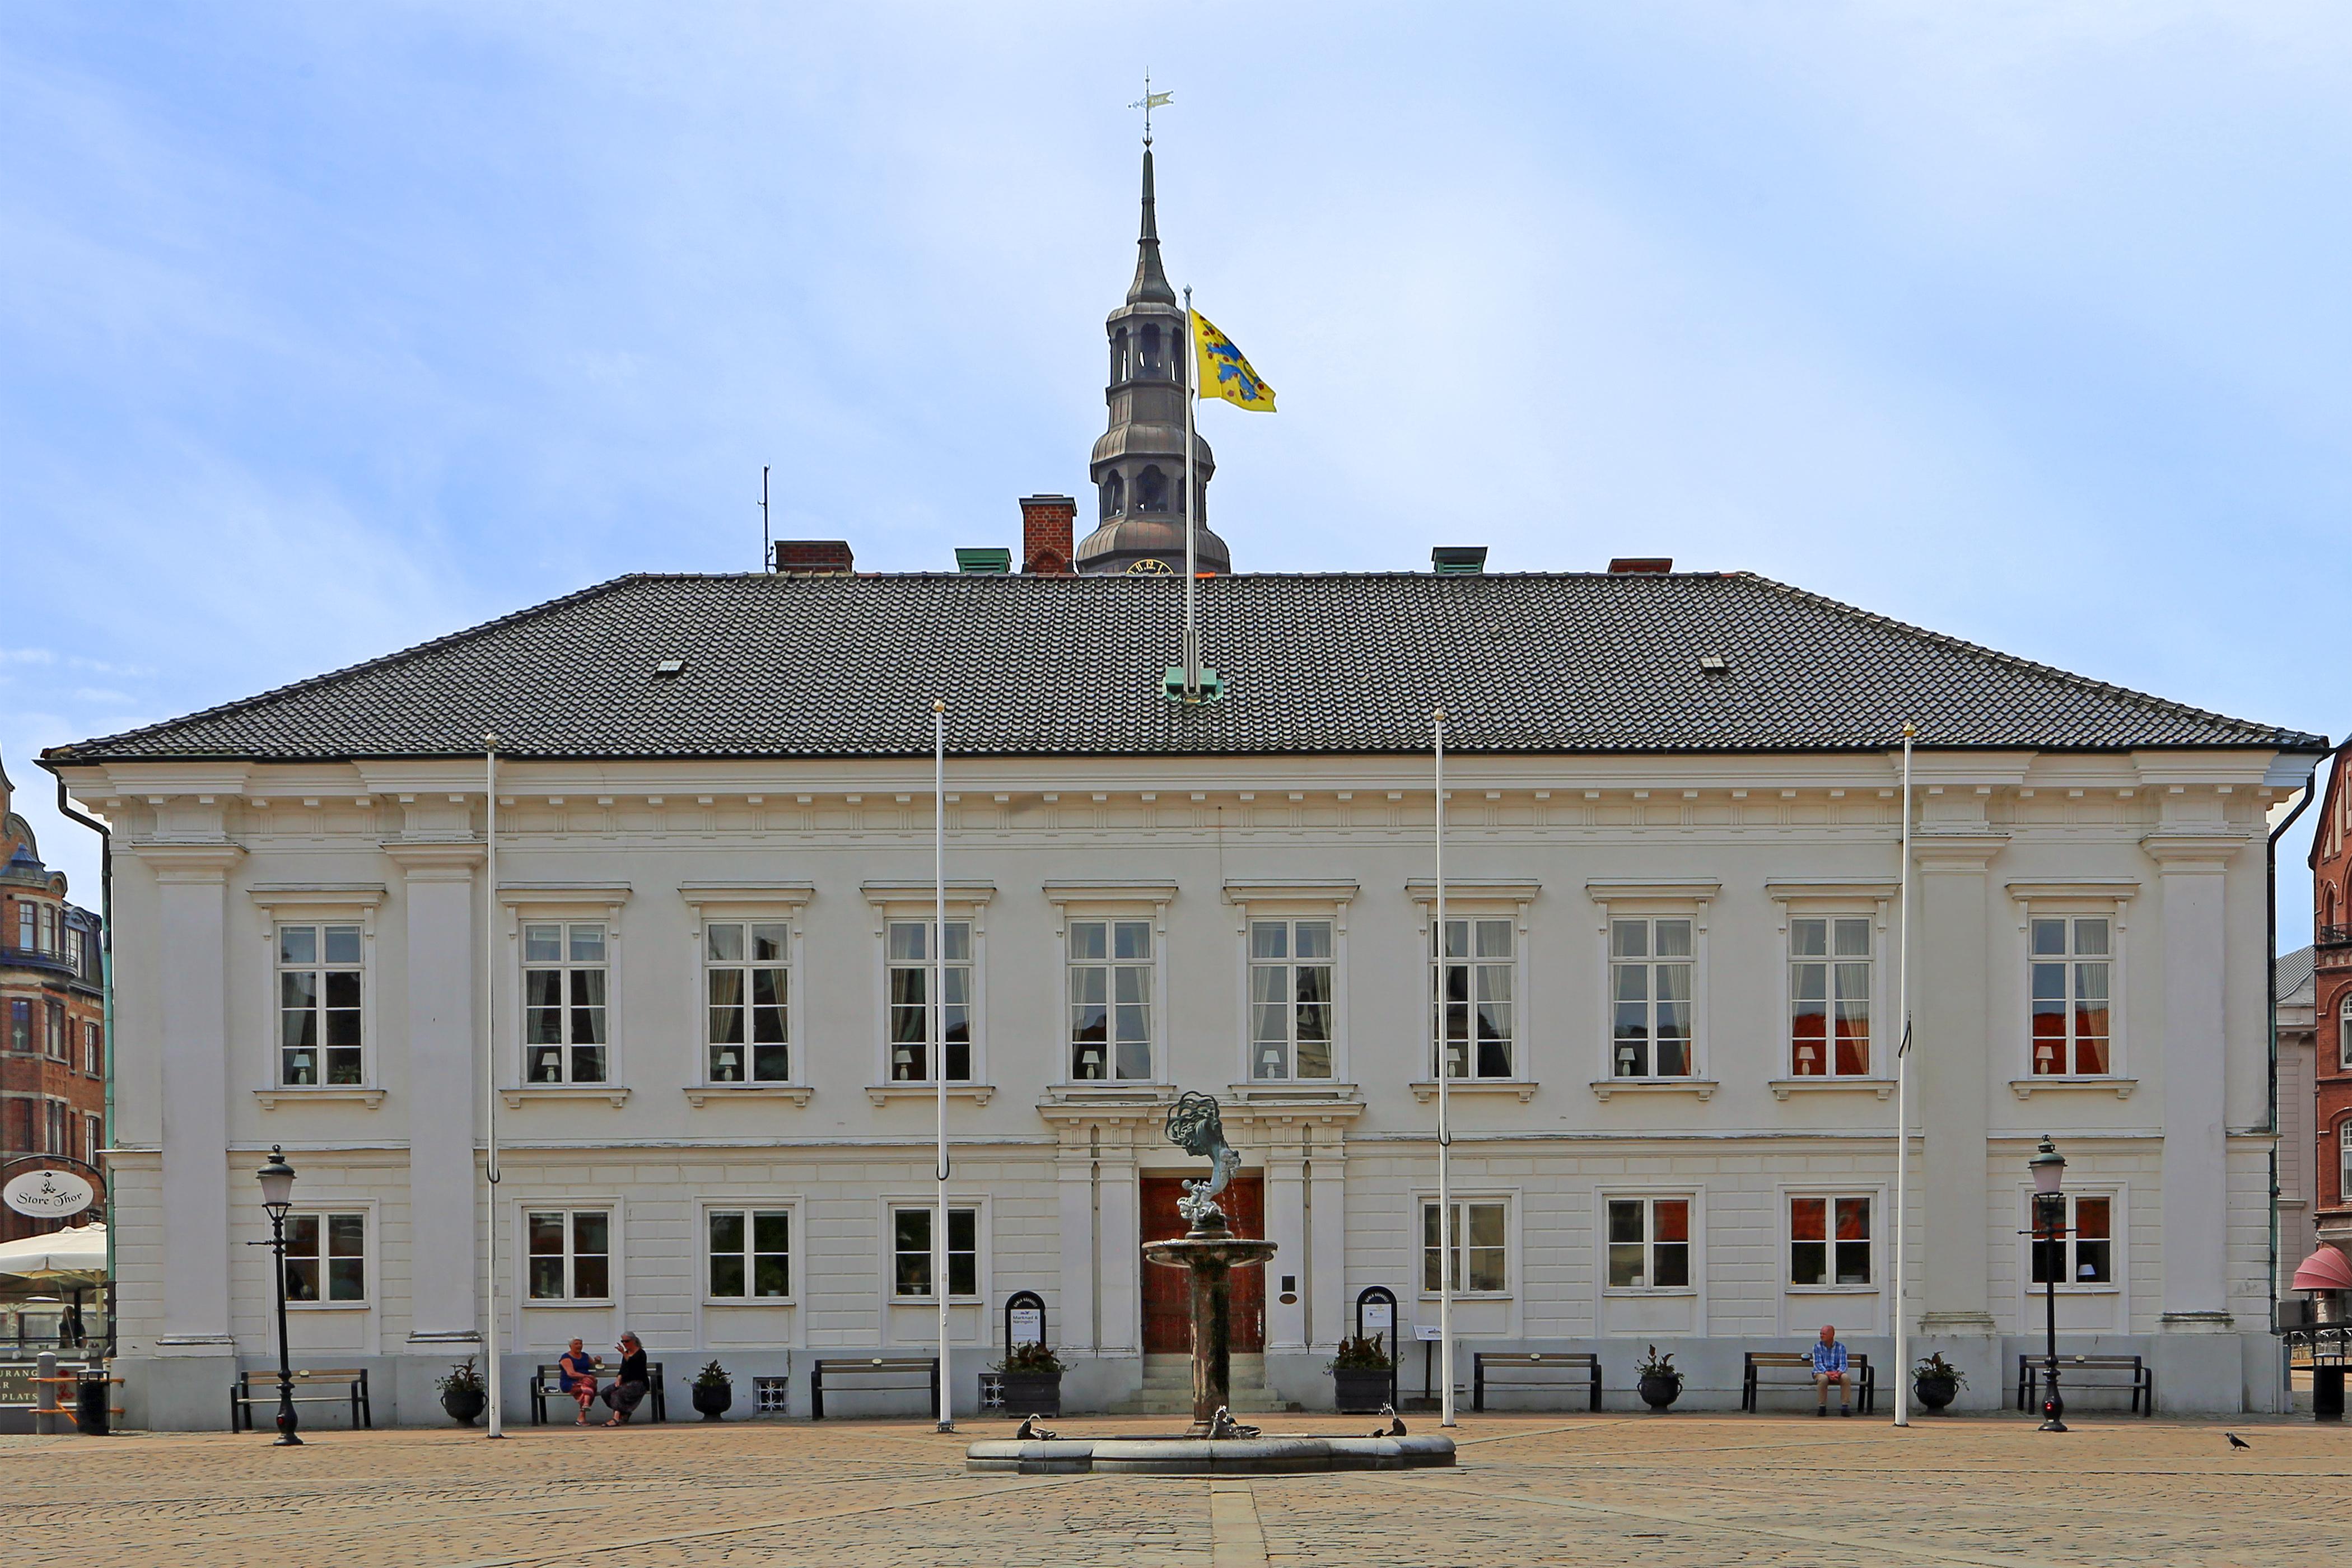 00_0944_Gamla_rådhuset,_Ystad